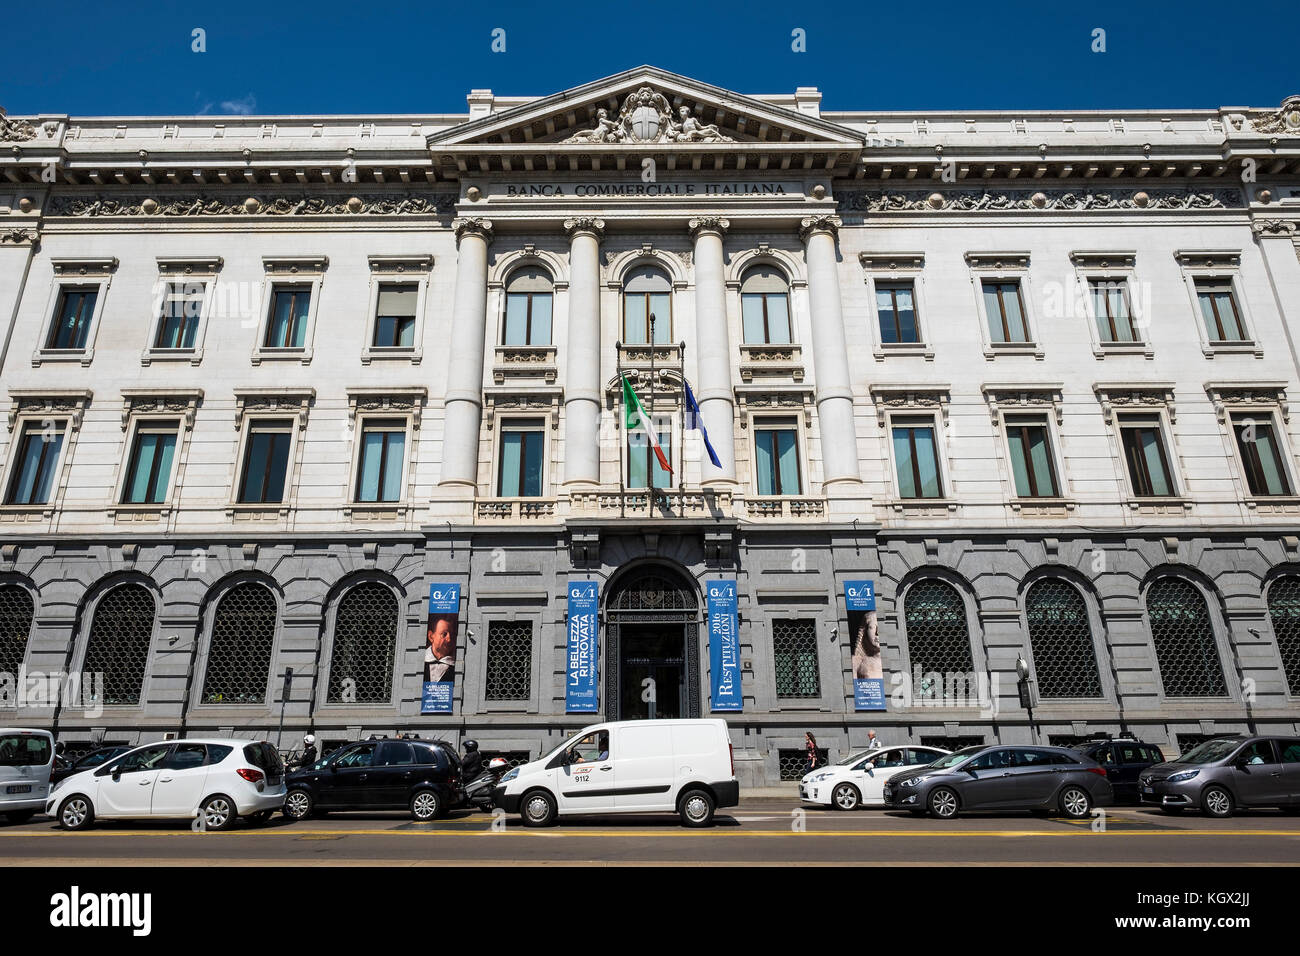 Italia,Milán,scala square,Banca Commerciale Italiana Imagen De Stock